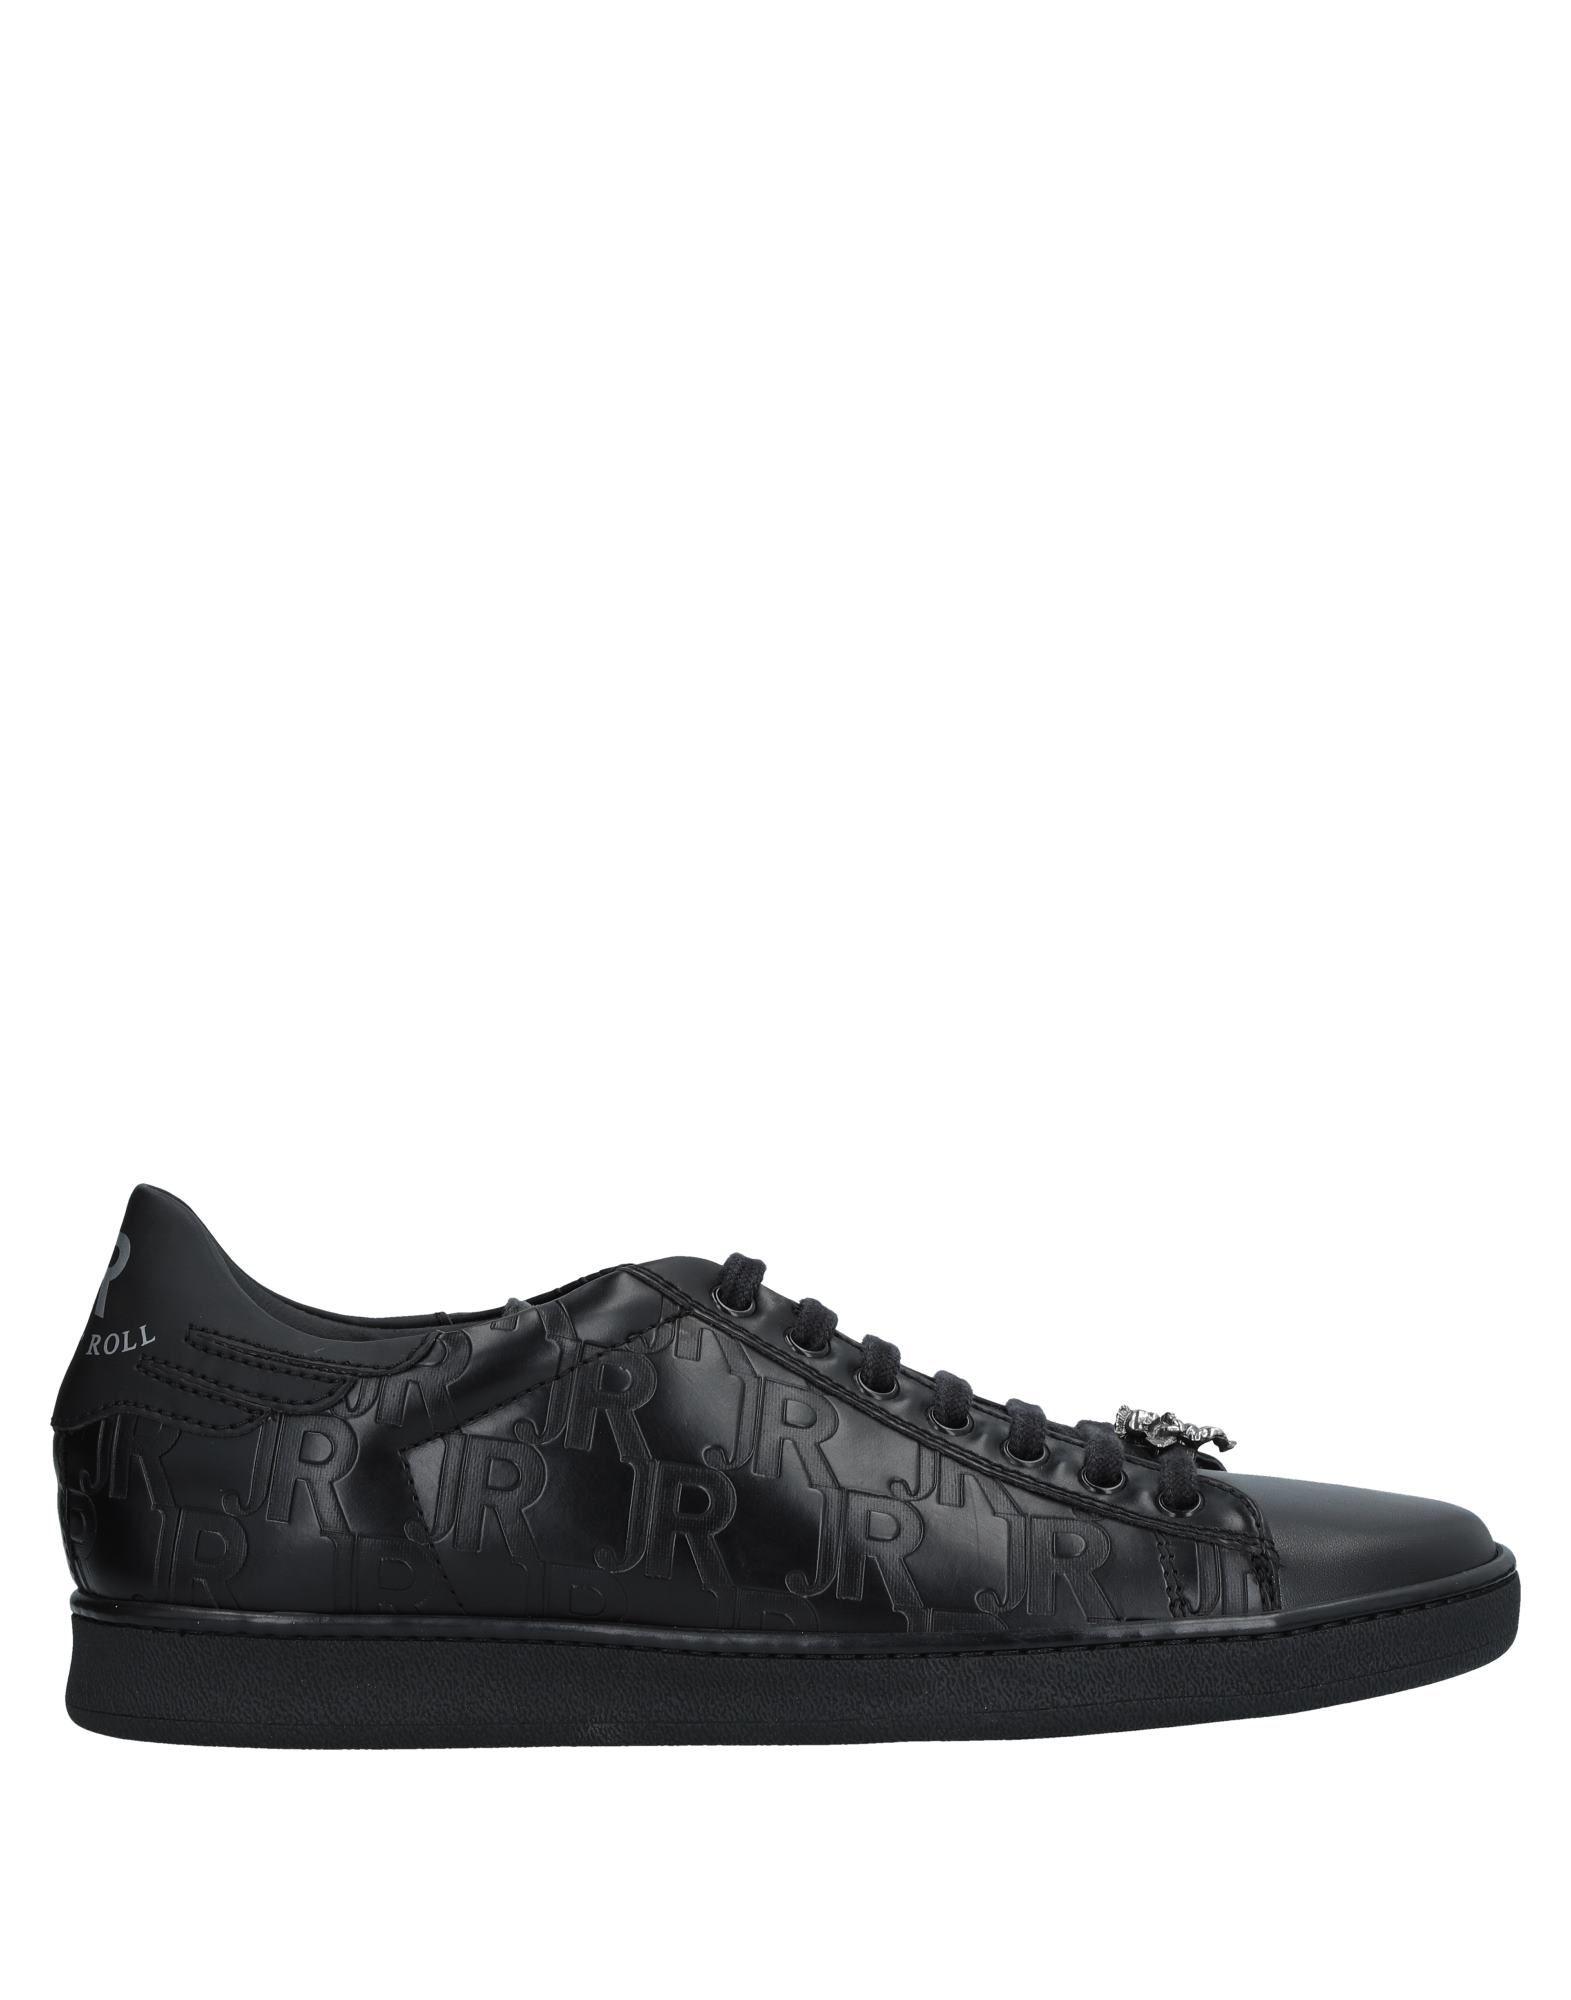 John Richmond Sneakers Herren  11538153TM Gute Qualität beliebte Schuhe